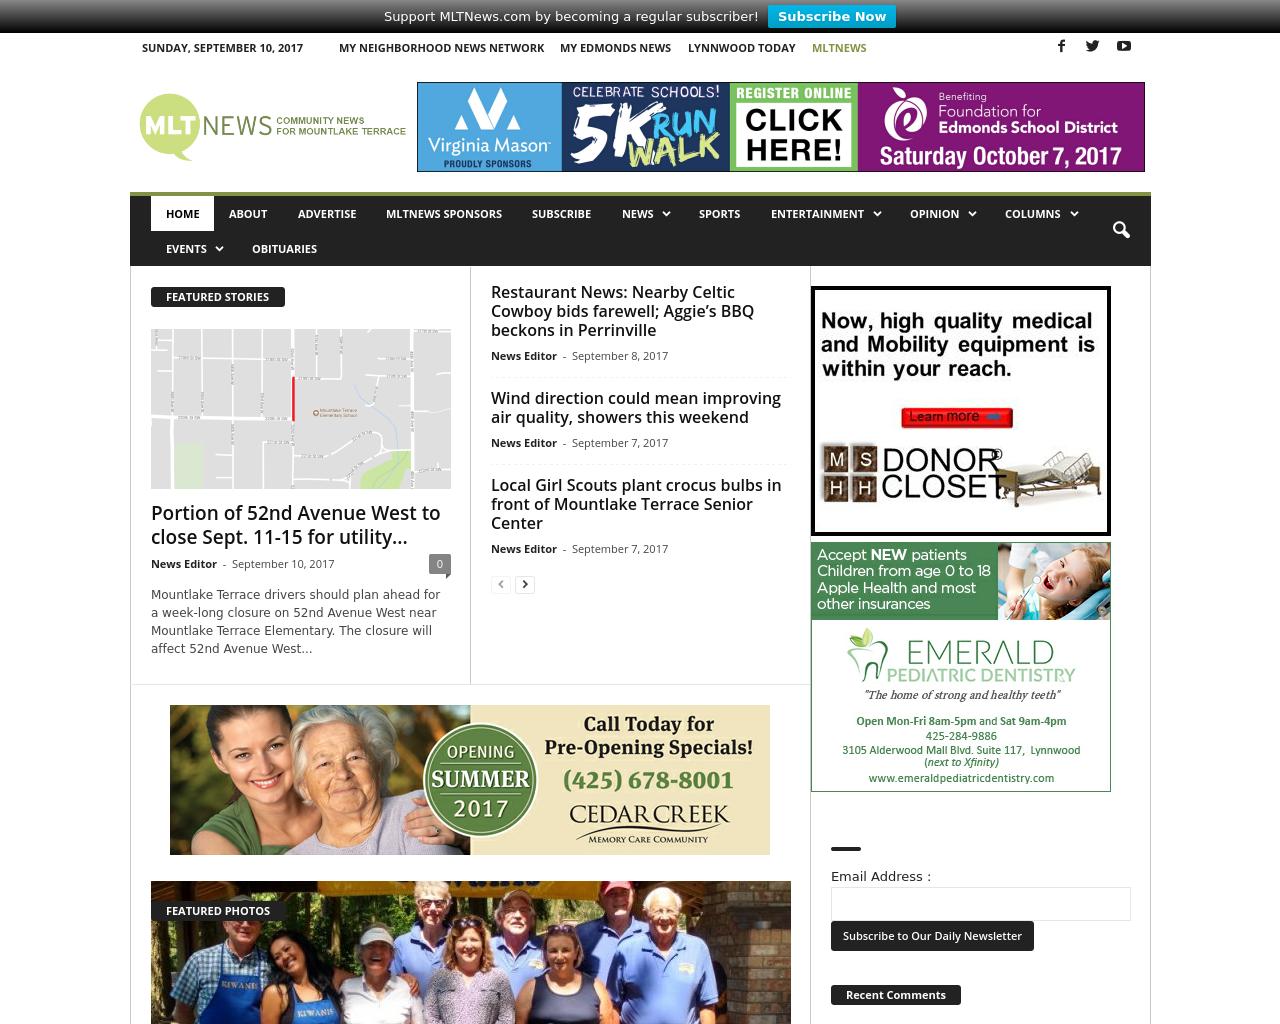 MLT-News-Advertising-Reviews-Pricing